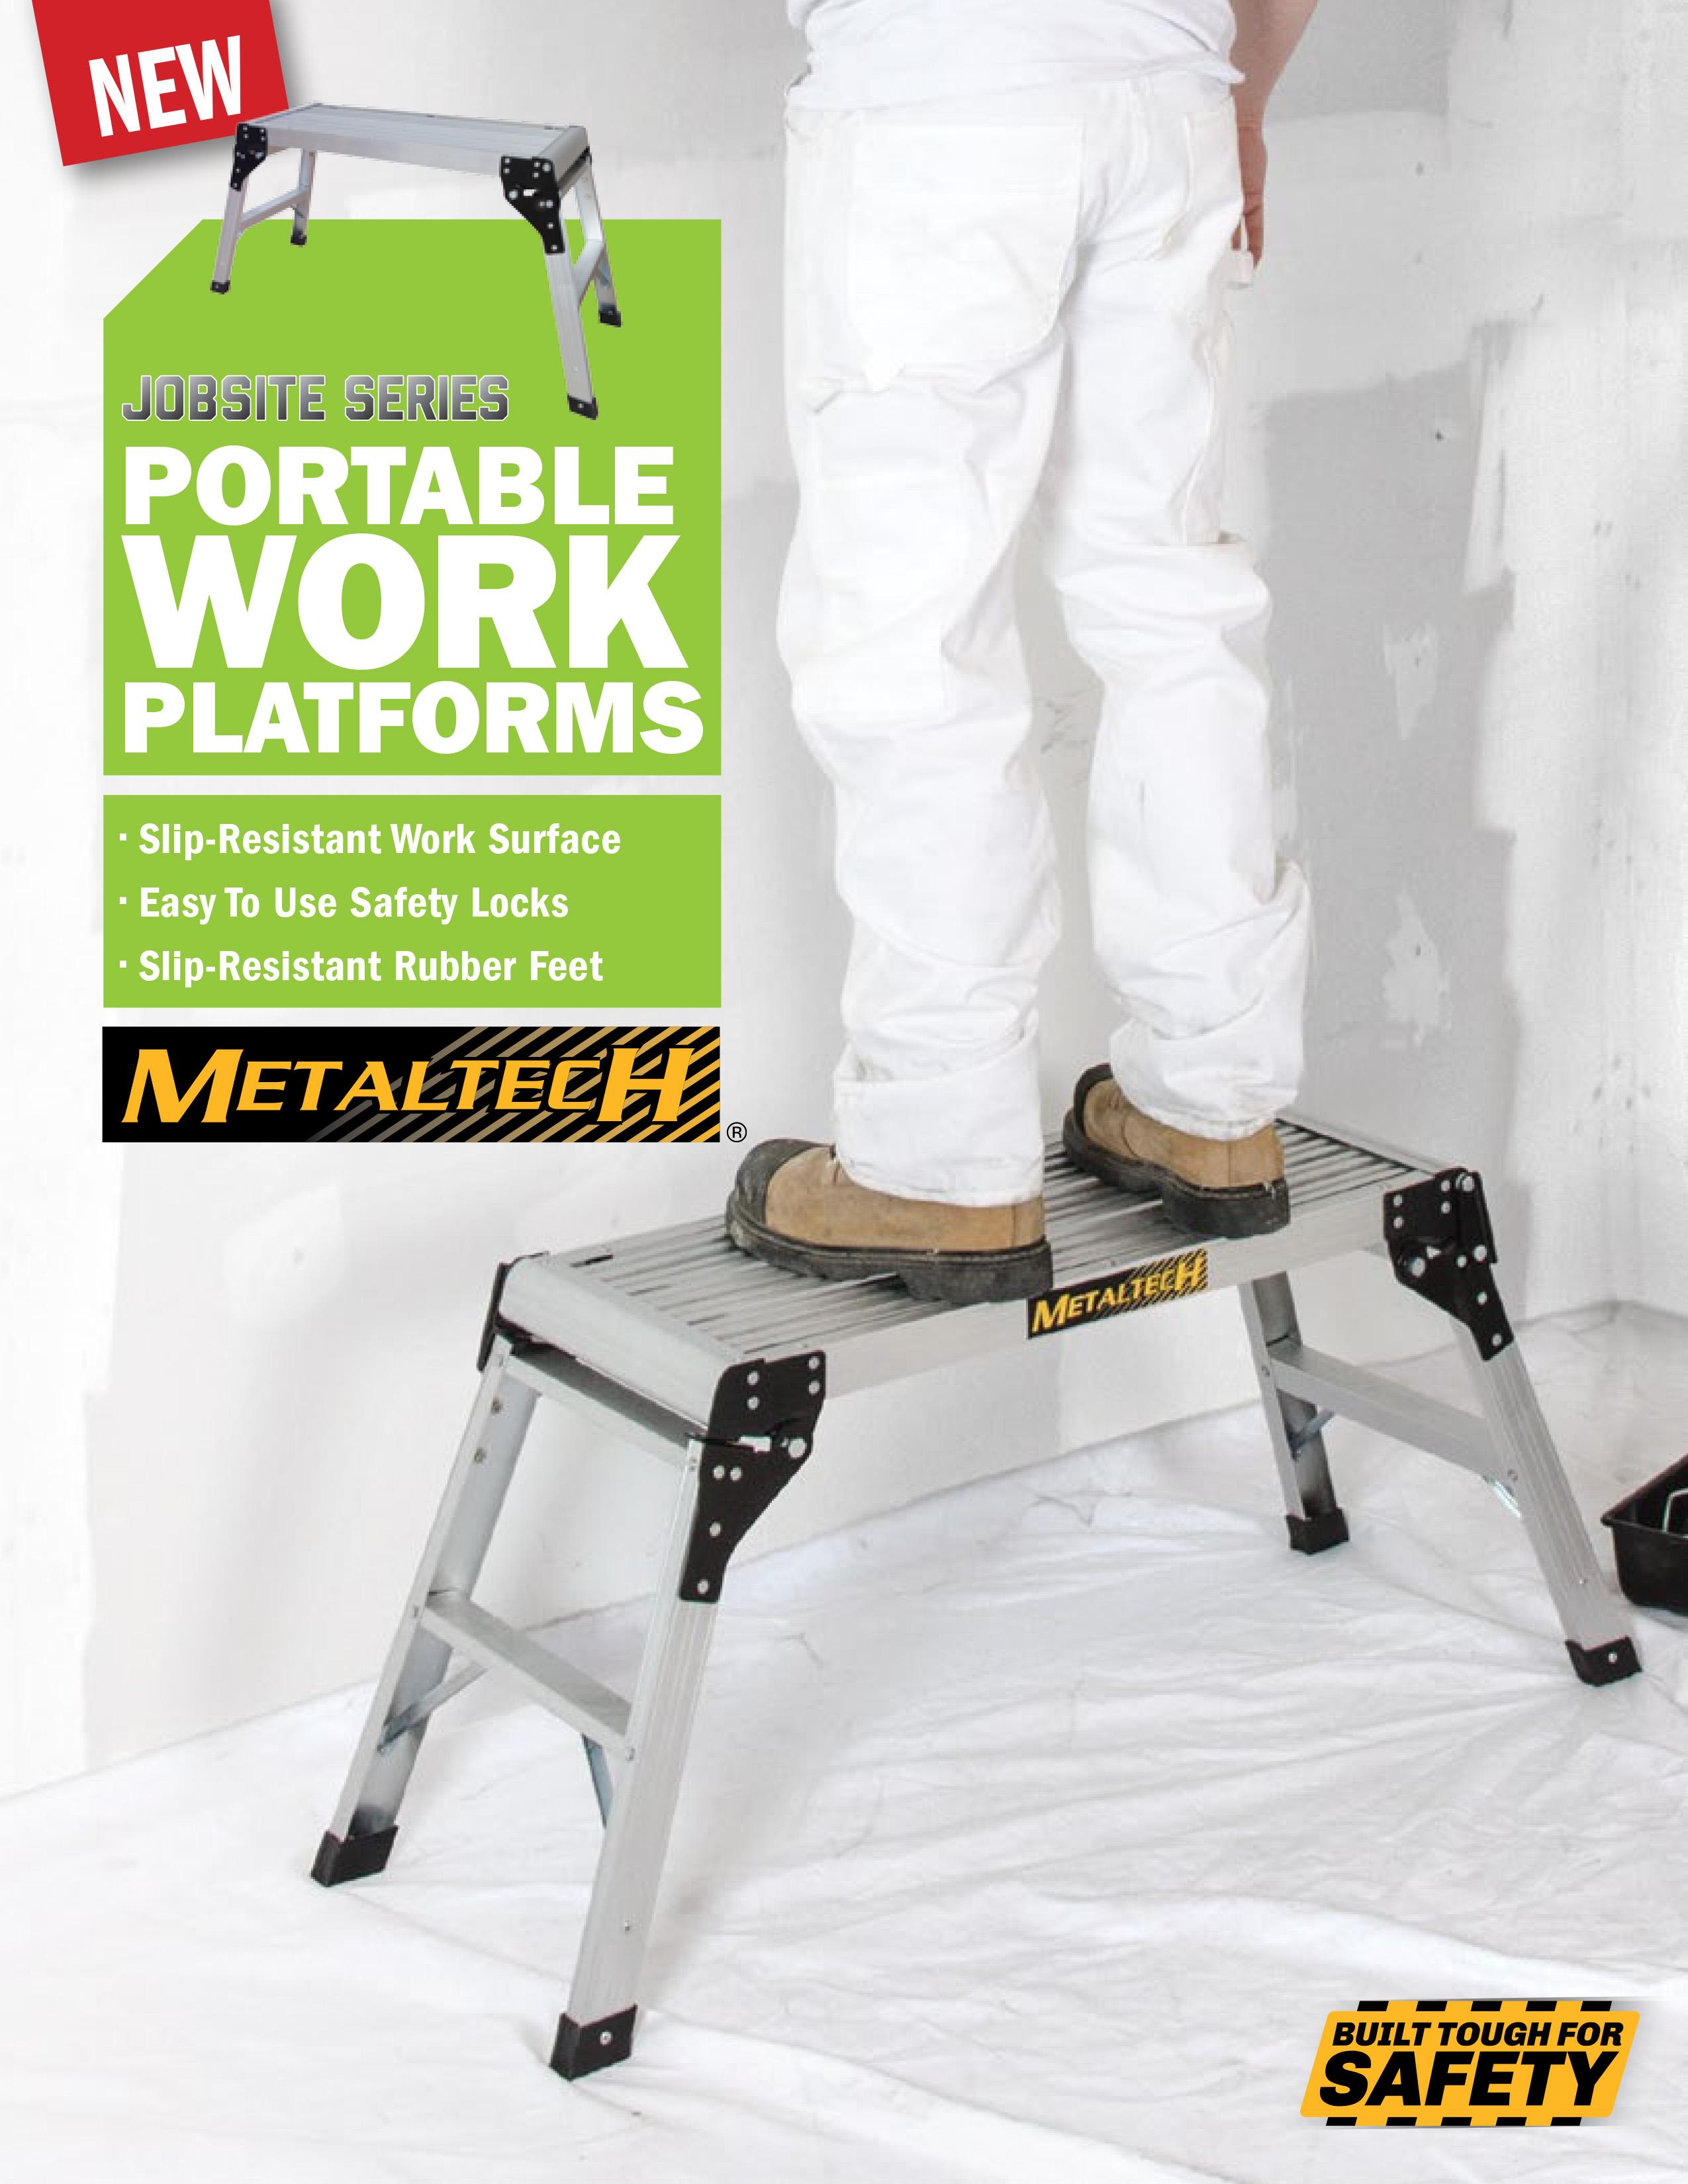 metaltech-portable-work-platform-1.jpg